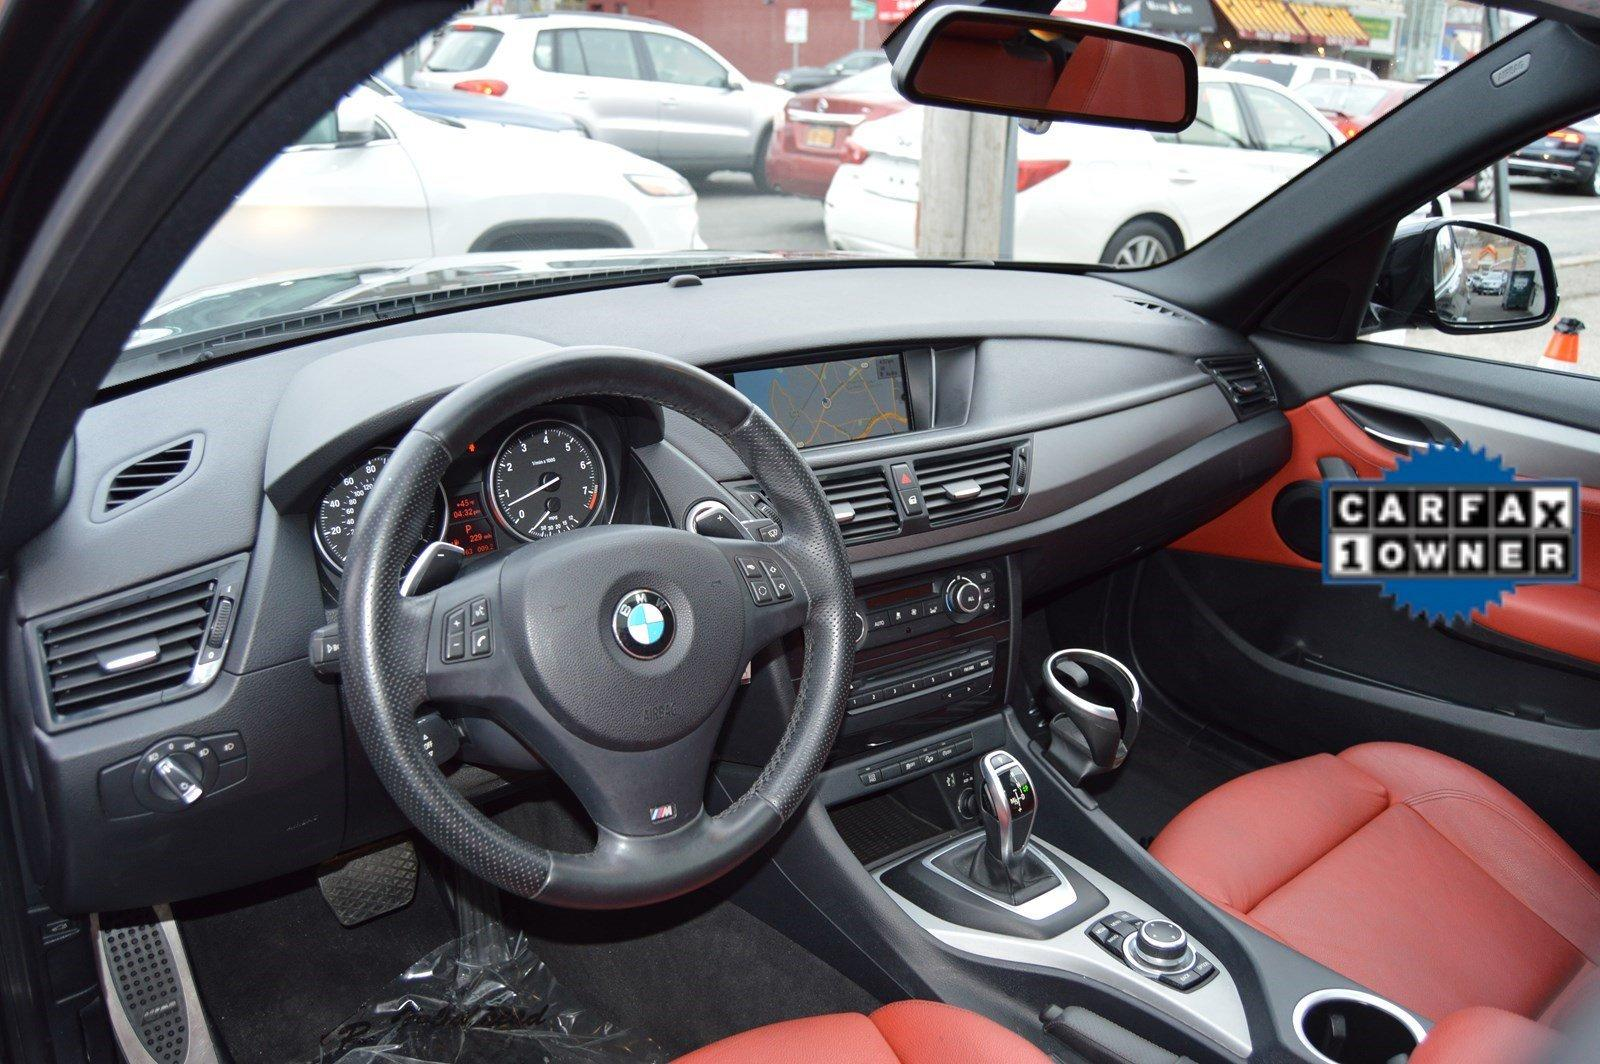 2014 Bmw X1 Xdrive28i Red Interior Stock 2787 For Sale Near Great Neck Ny Ny Bmw Dealer